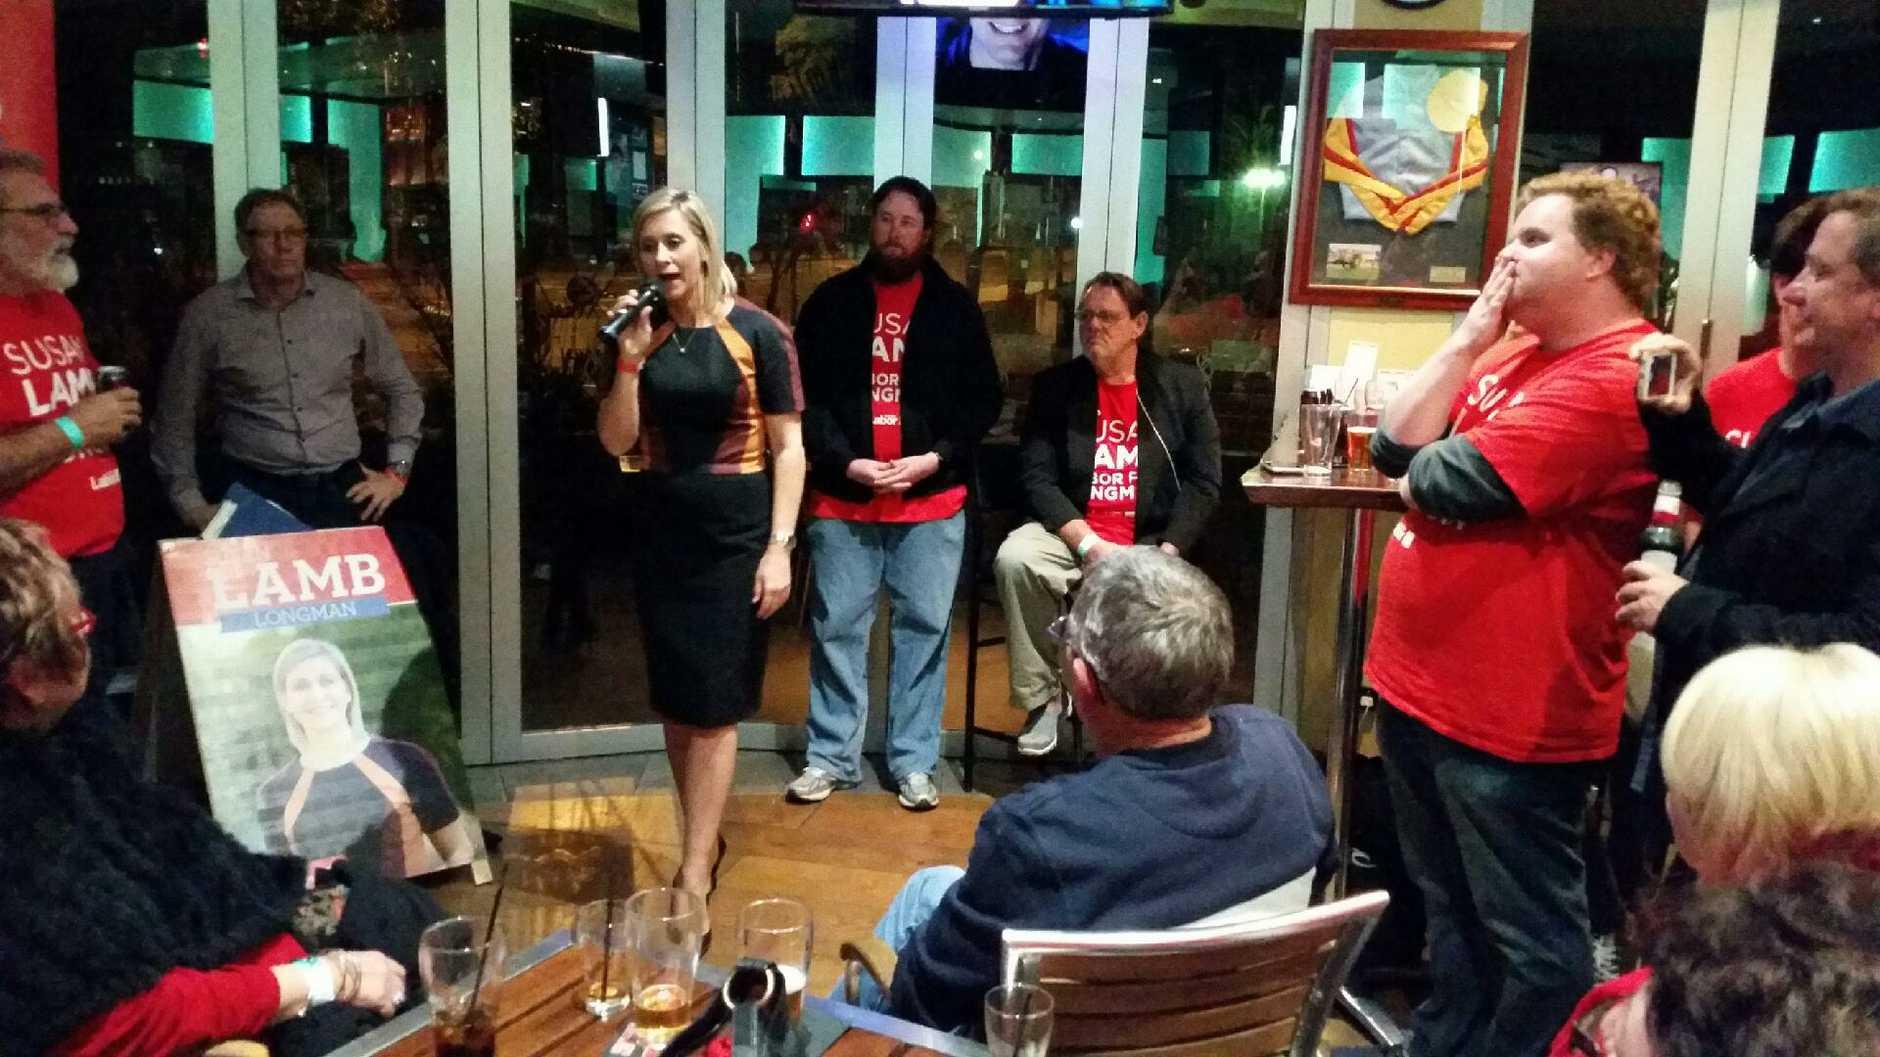 Susan Lamb claims victory in Longman